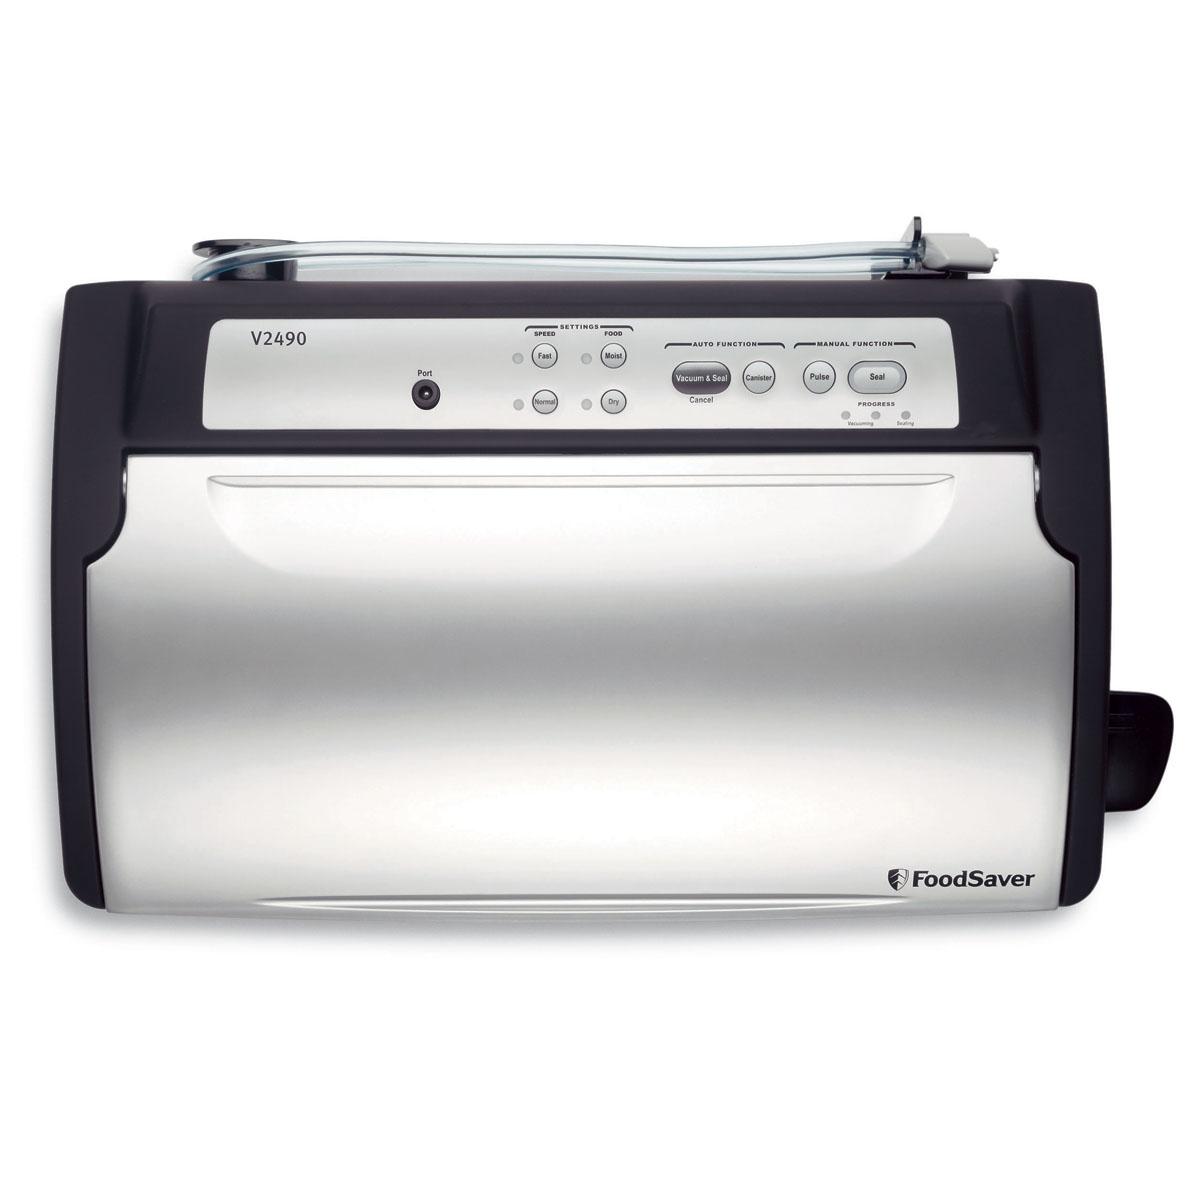 Countertop Vacuum Sealer : FoodSaver? Countertop V2490 Vacuum Sealing System, Stainless Steel ...